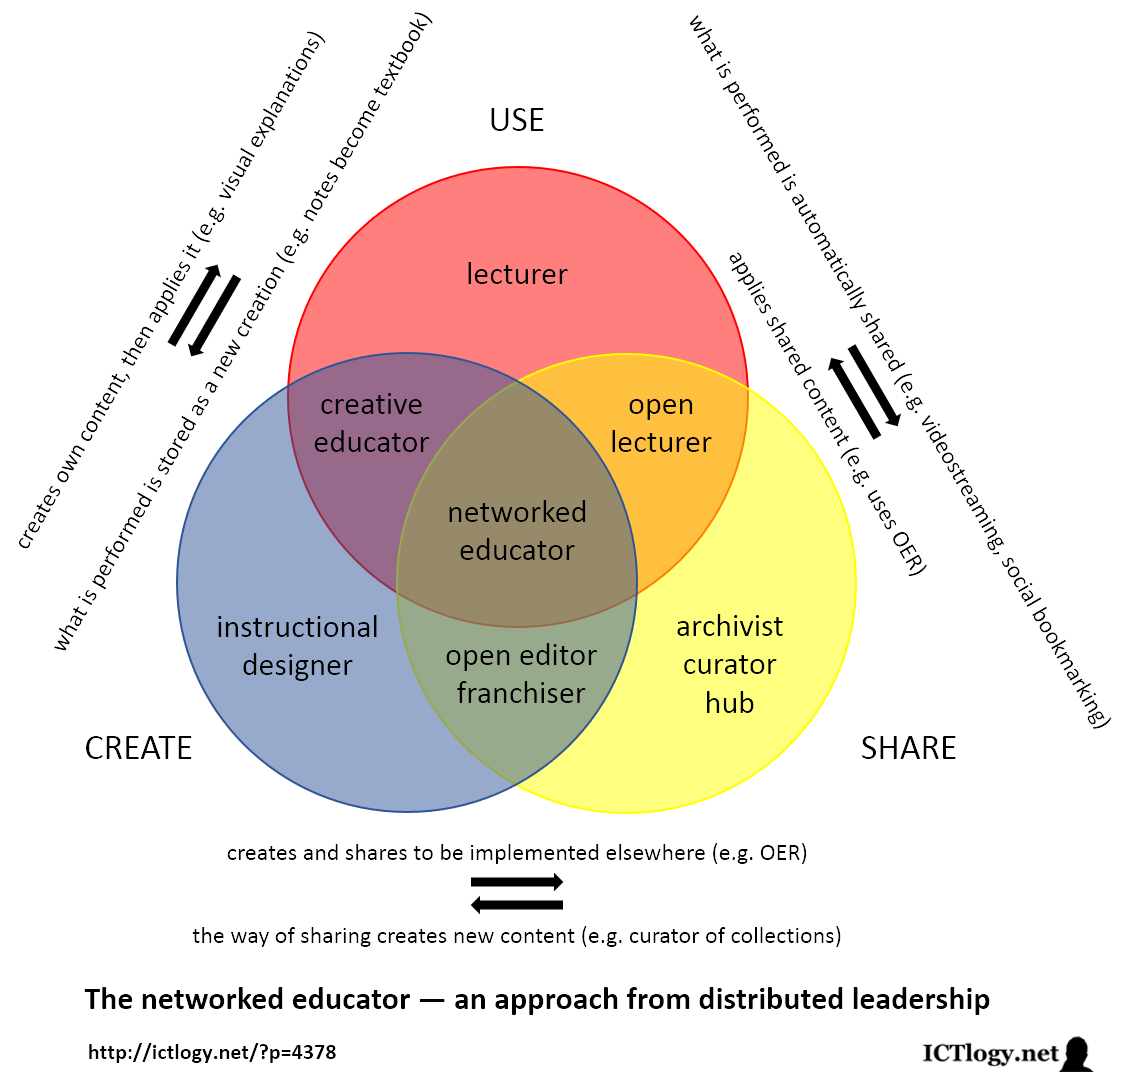 ictlogy  u00bb ict4d blog  u00bb the networked educator  u2014 an